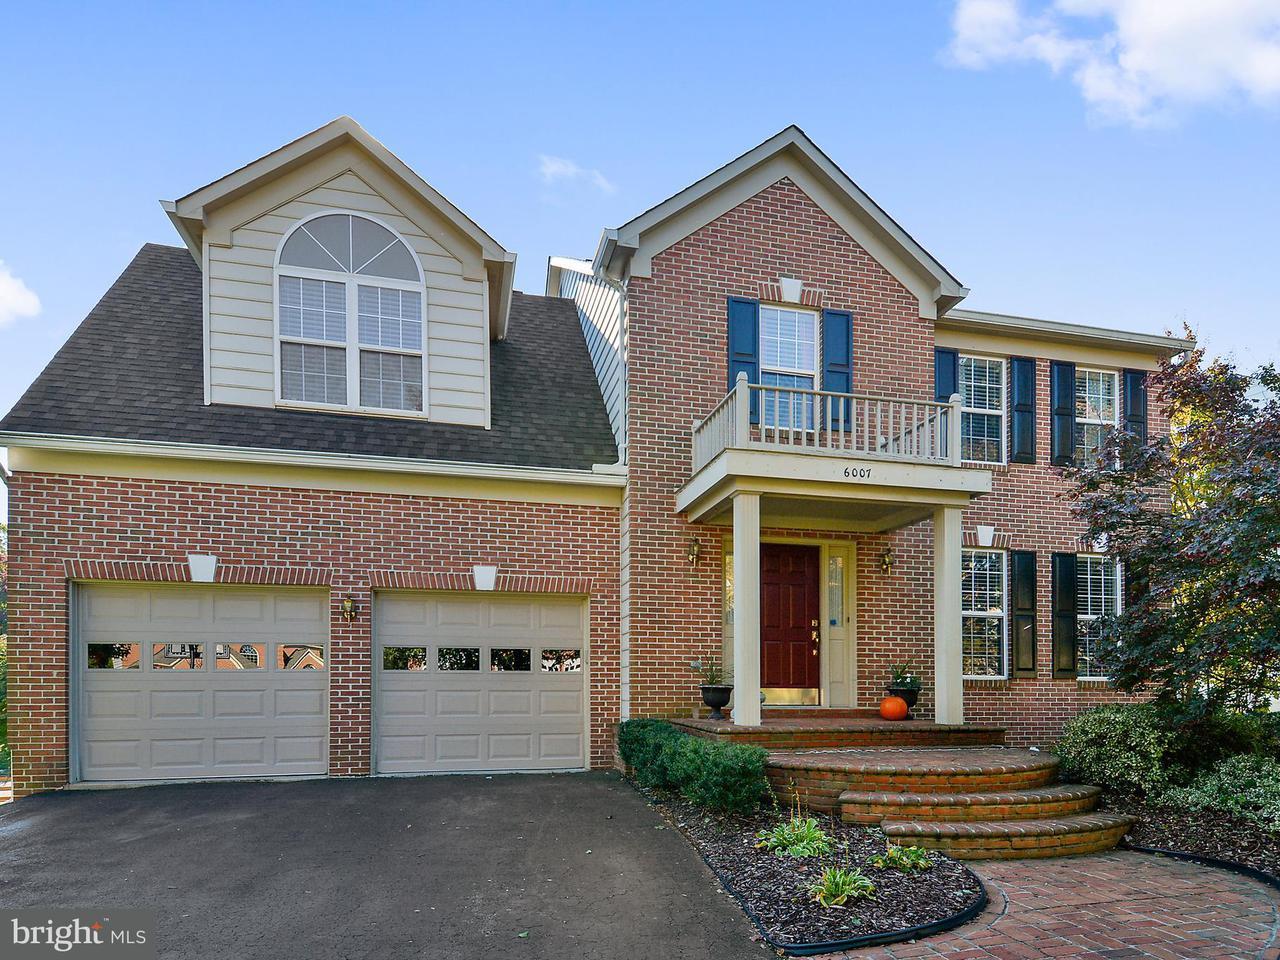 Single Family Home for Sale at 6007 WOODLAKE Lane 6007 WOODLAKE Lane Alexandria, Virginia 22315 United States